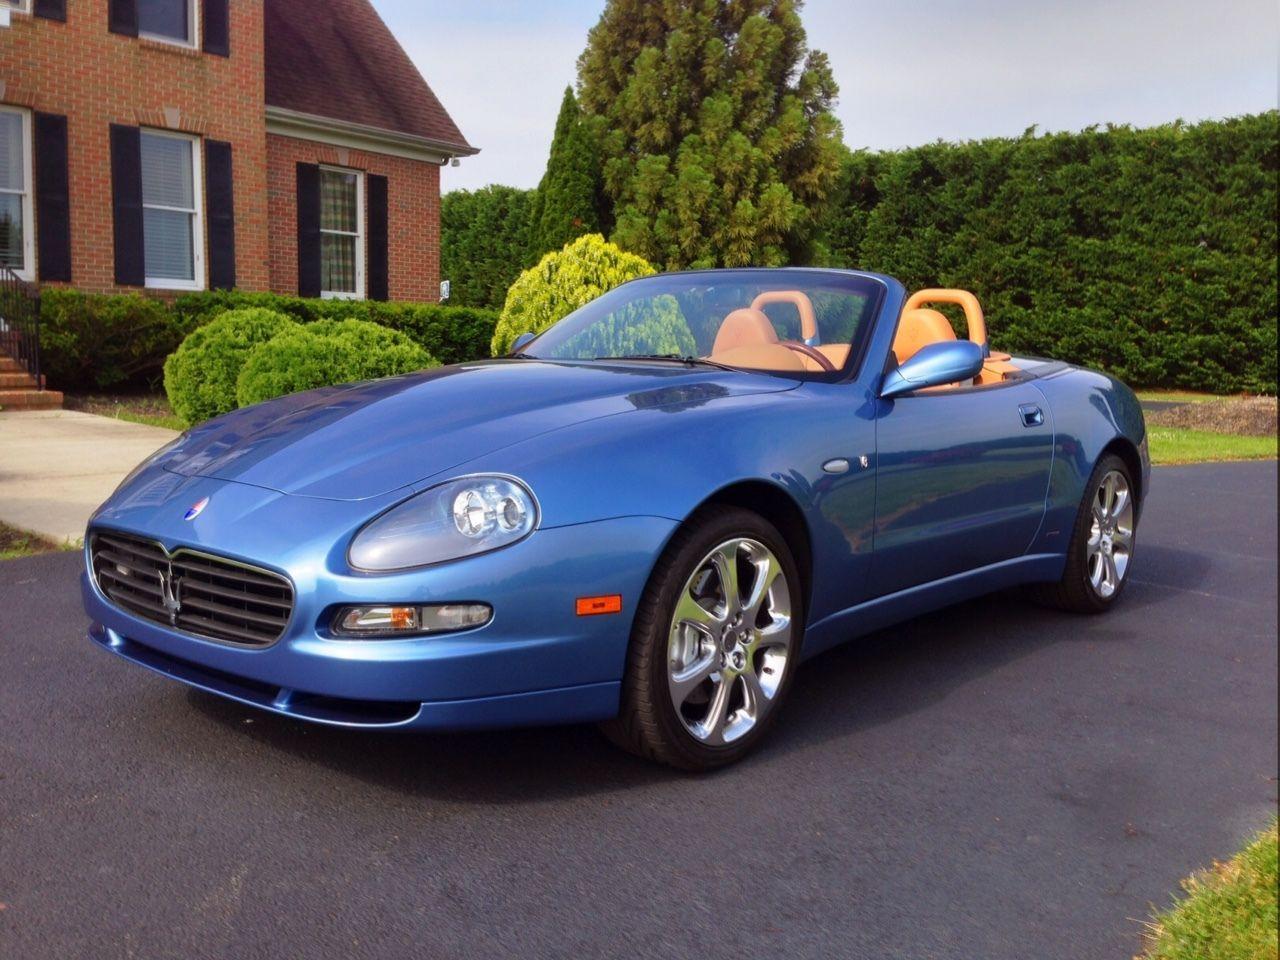 2005 Maserati Spyder for sale